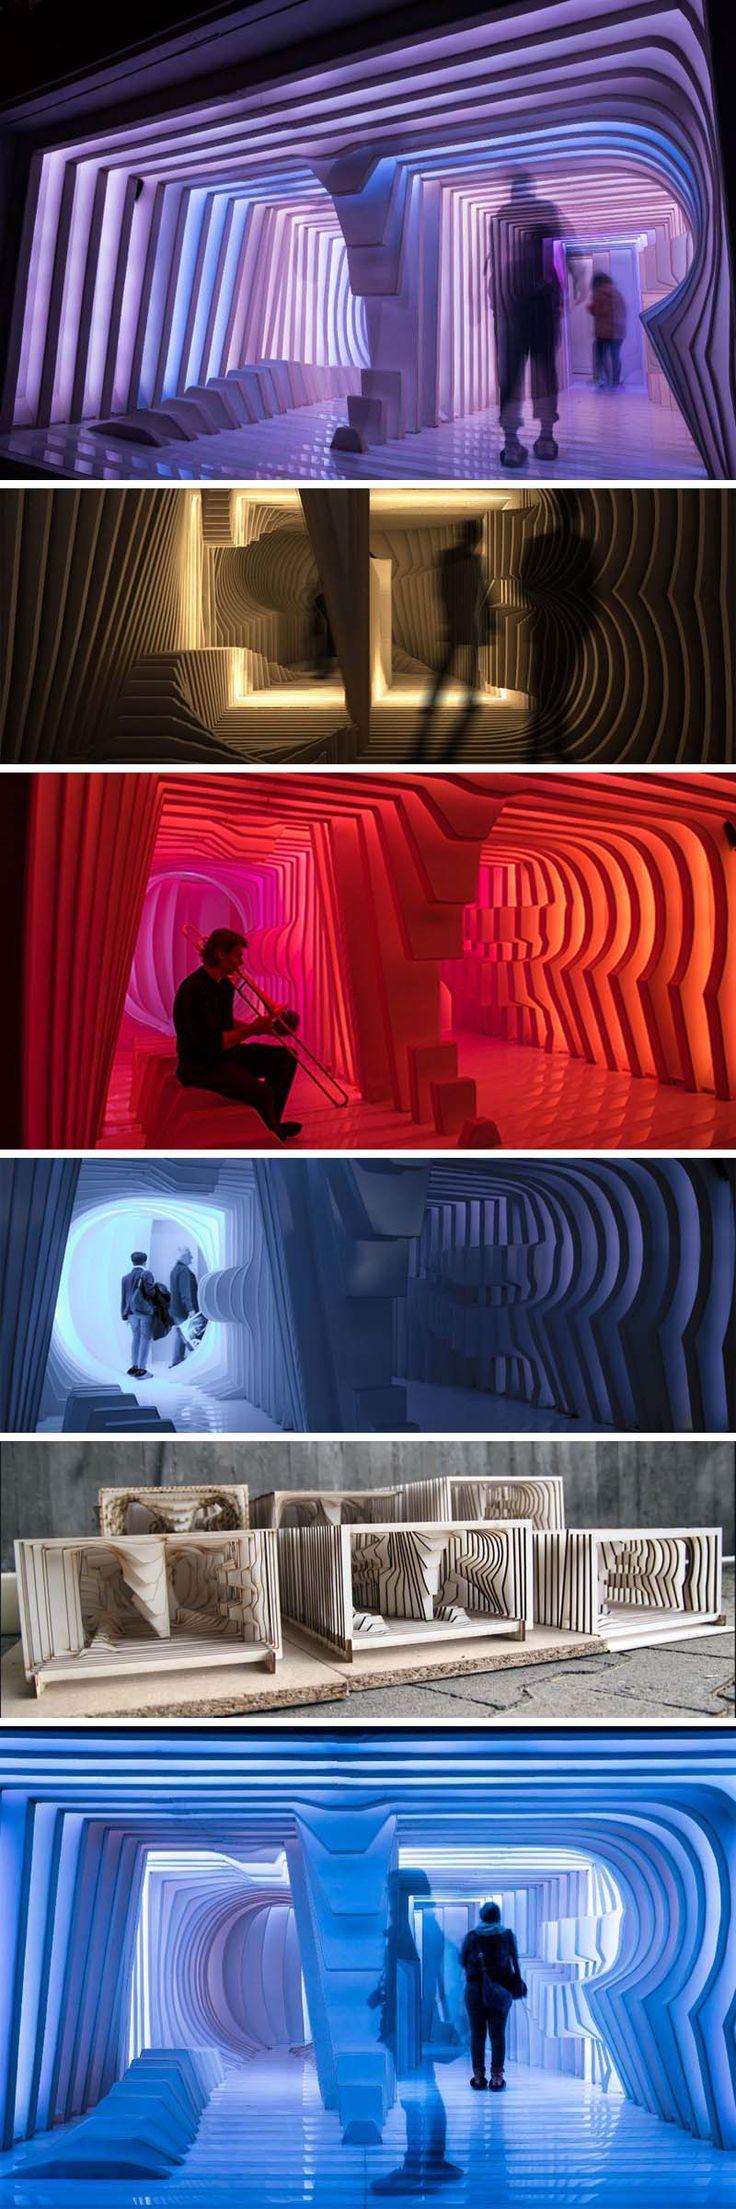 Cornea Ti, Luminale 2014, FH Mainz, Light, sound and type installation